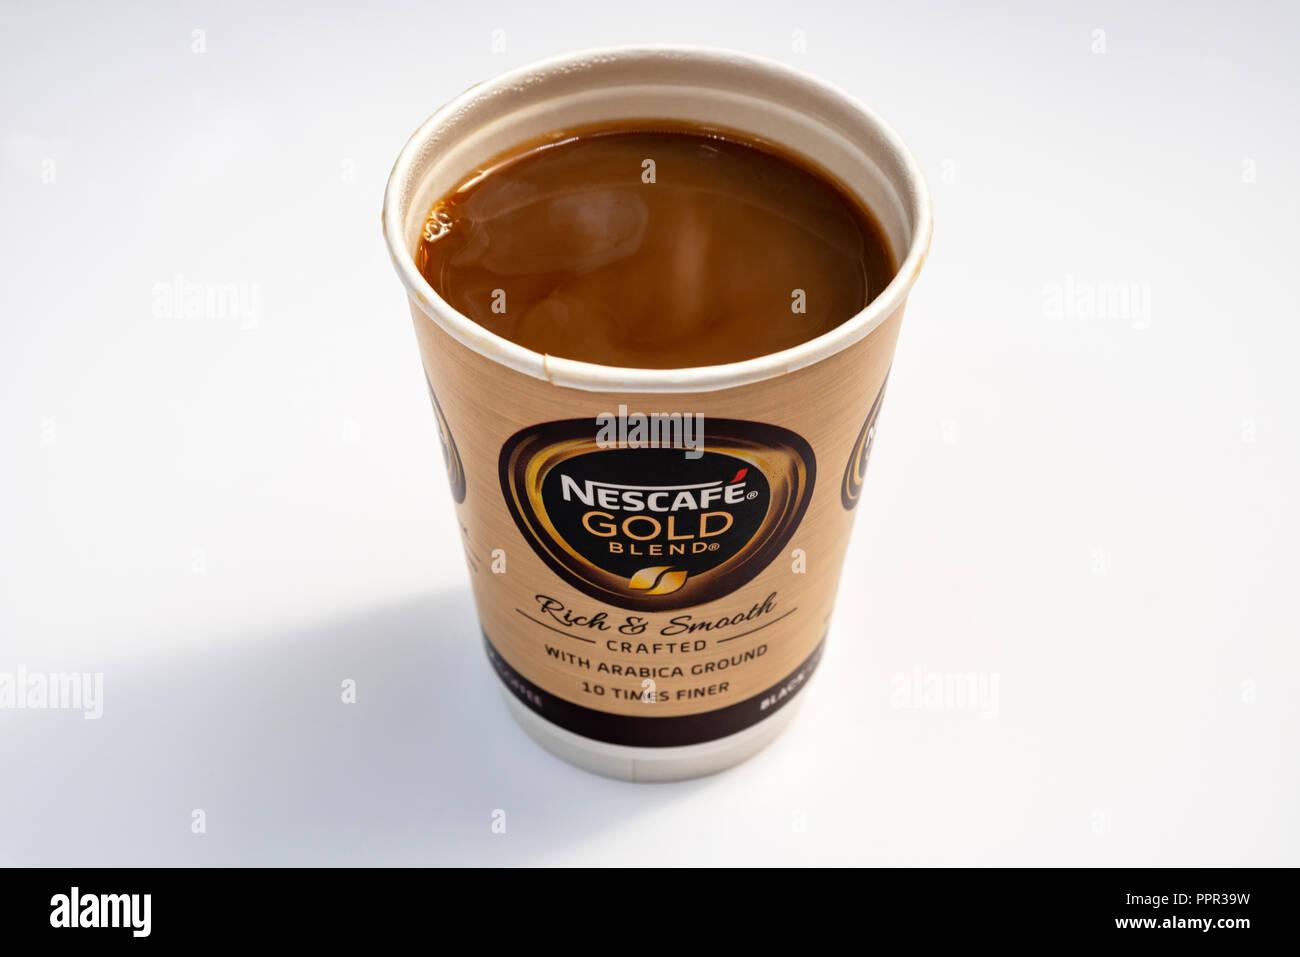 Nescafe Gold take away coffee - Stock Image